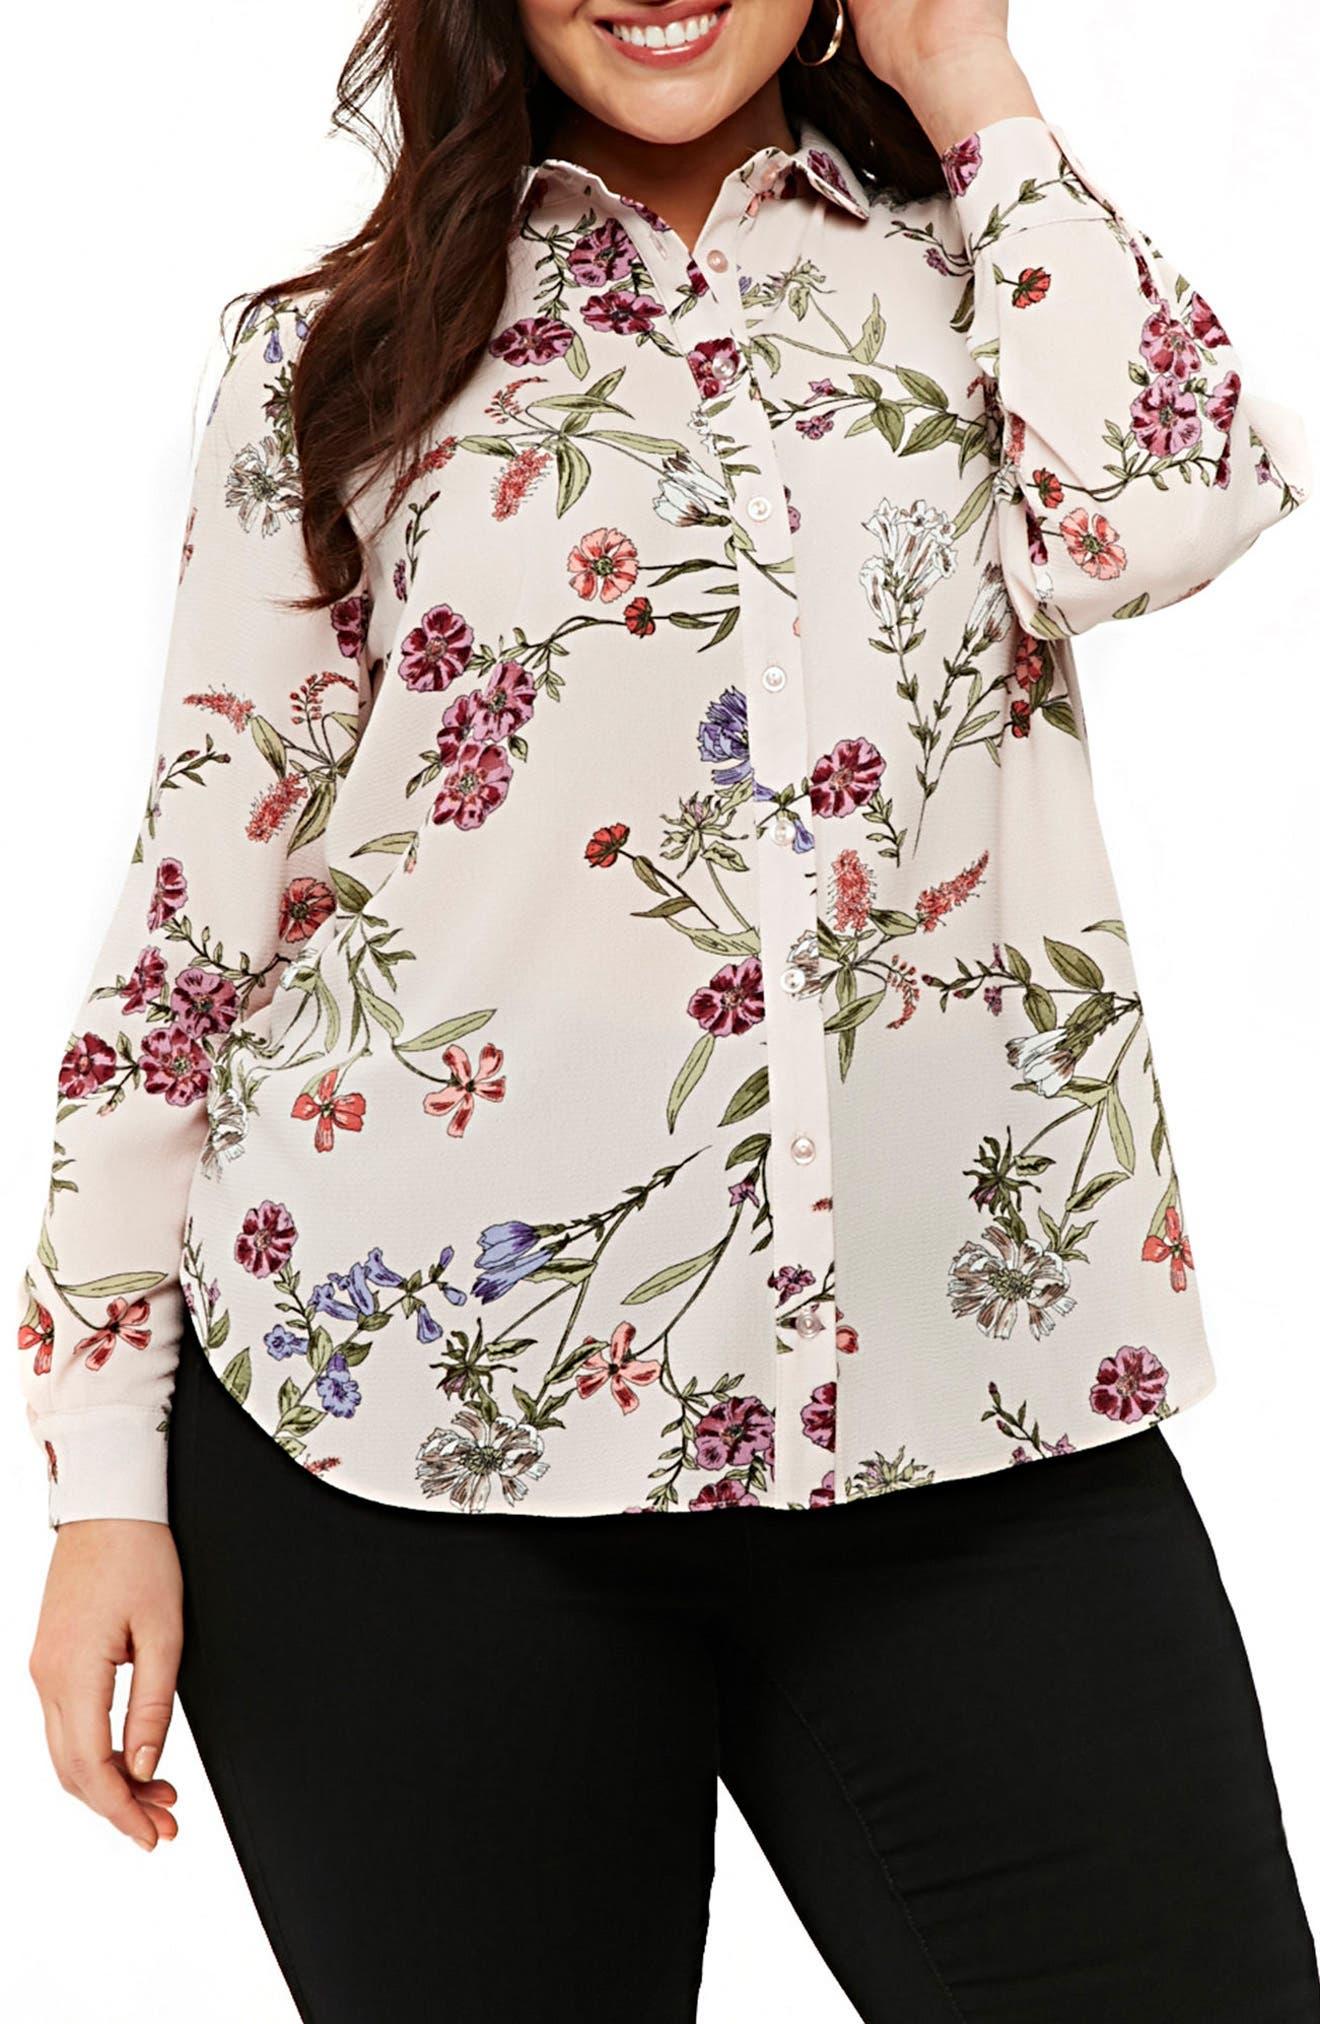 Blush Floral Print Shirt,                         Main,                         color, DARK MULTI